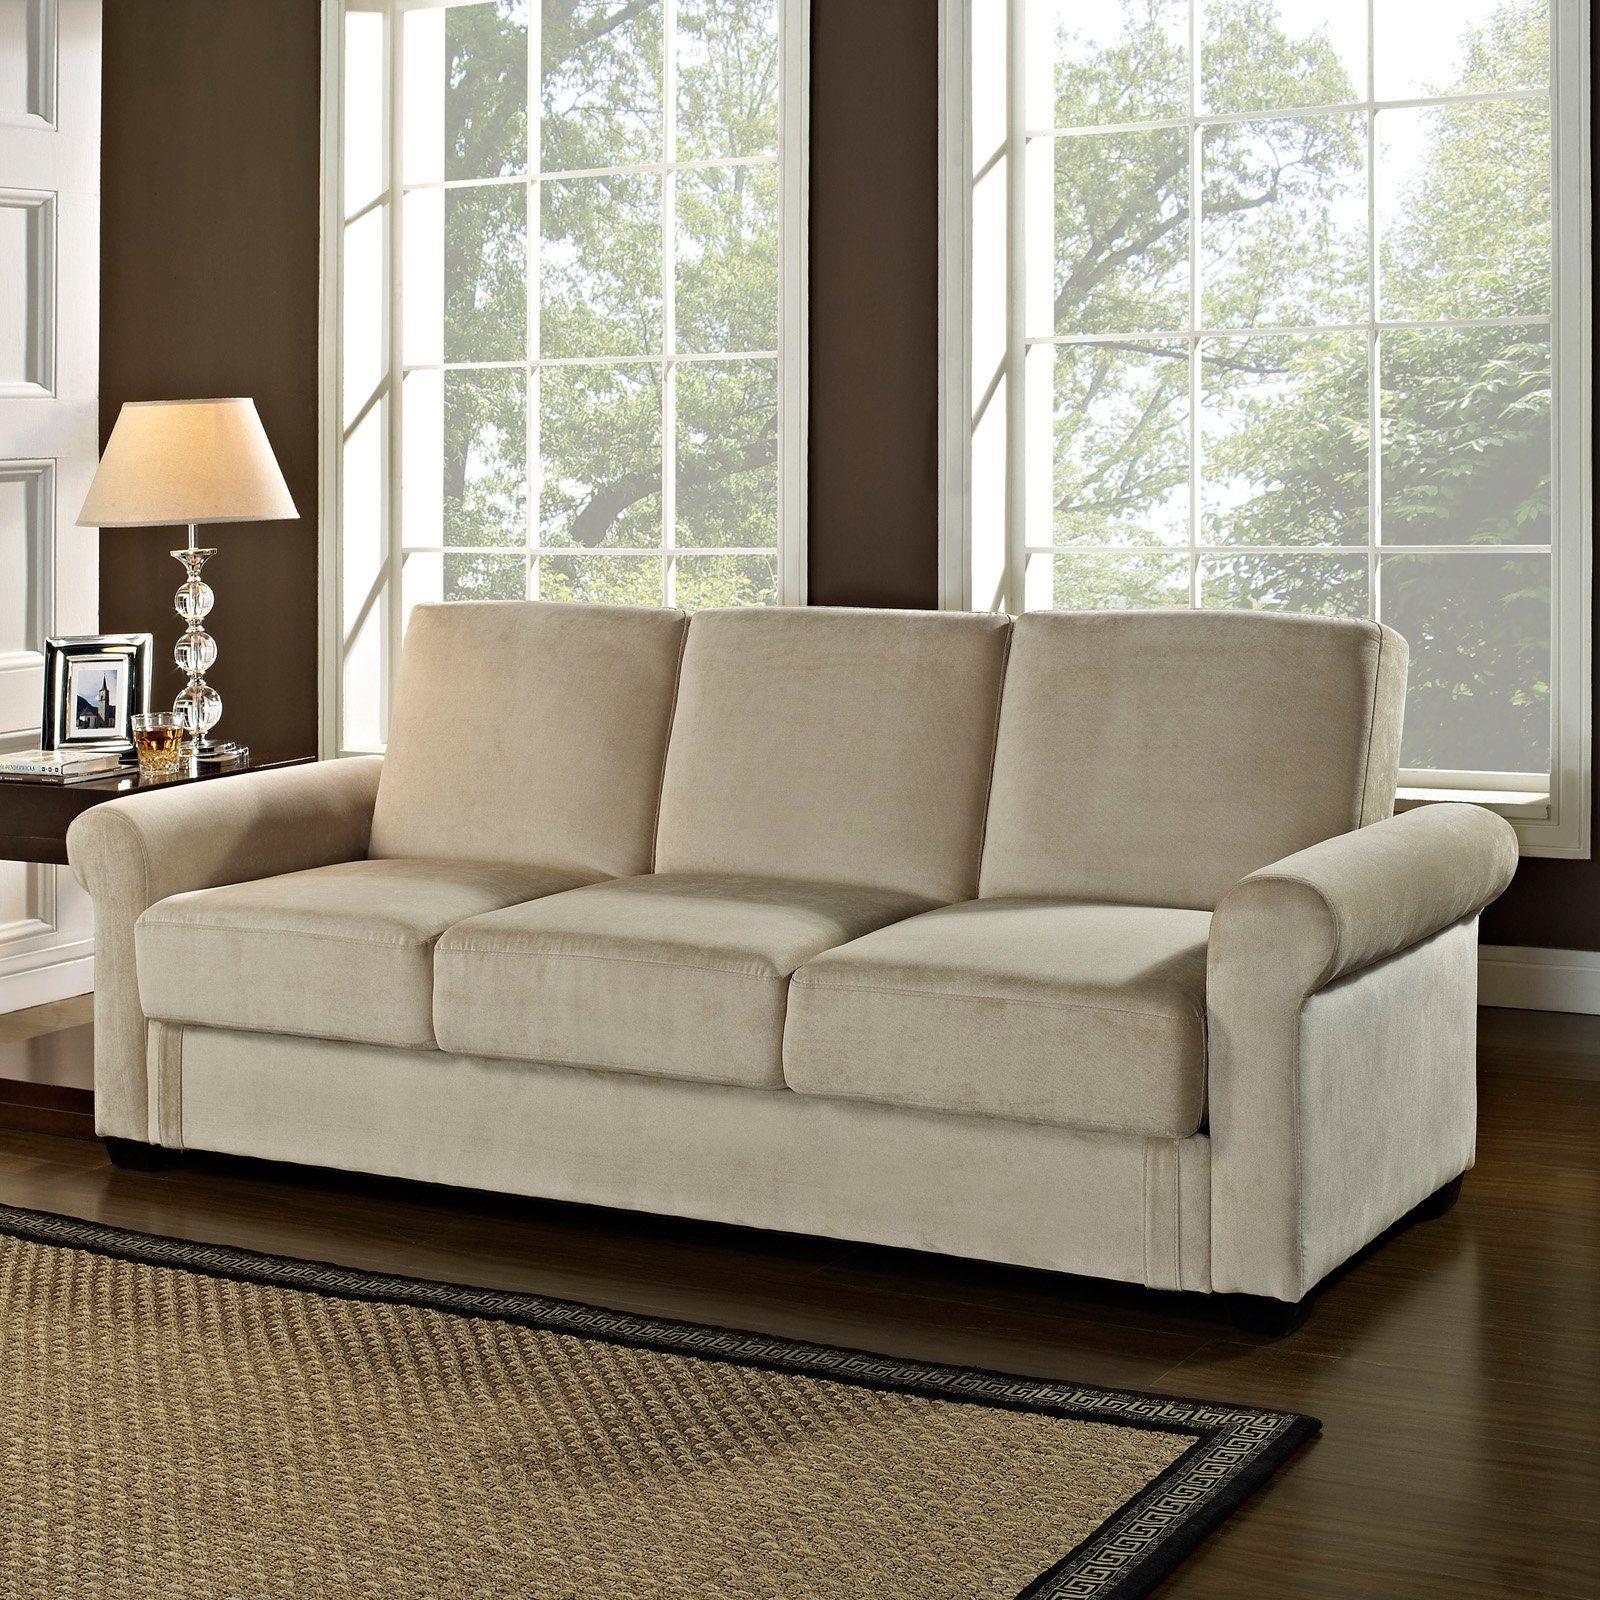 Serta dream convertible thomas sofa light brown from hayneedle